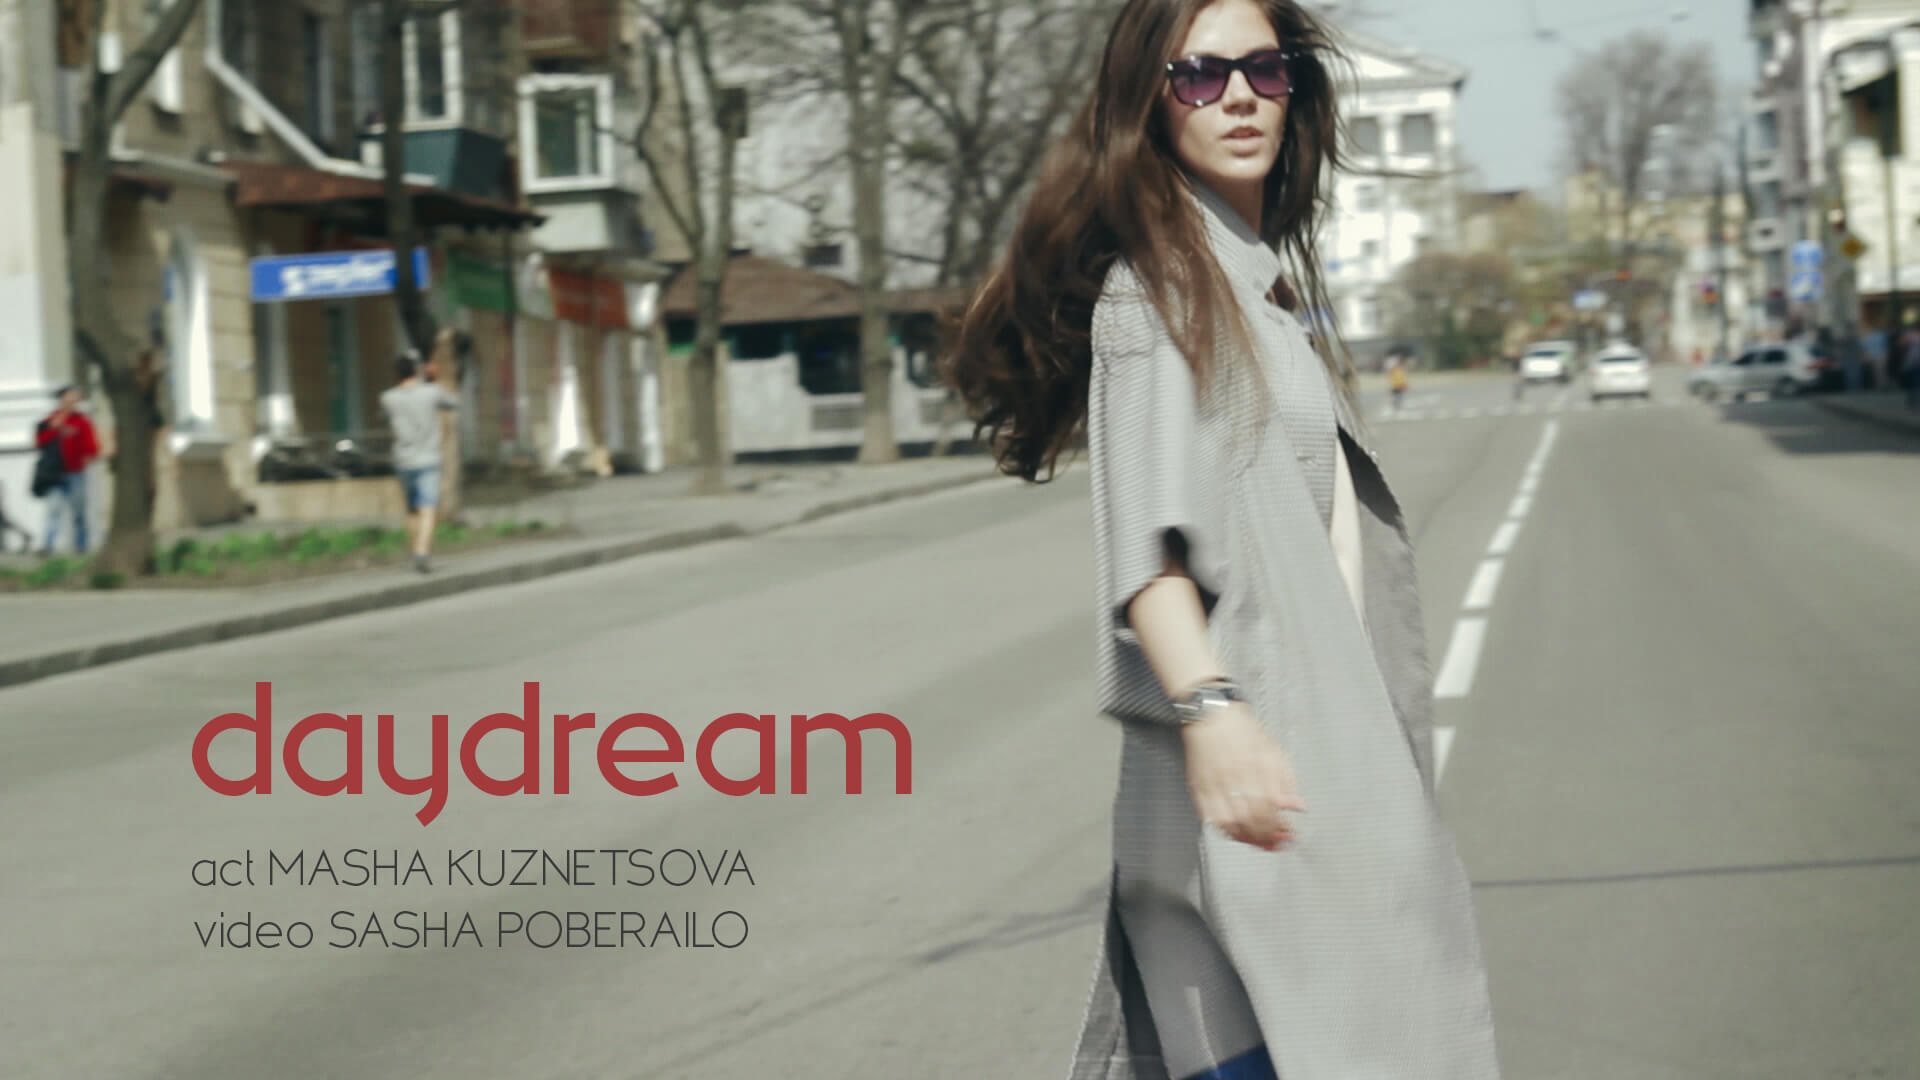 daydream fashion short film - Actors